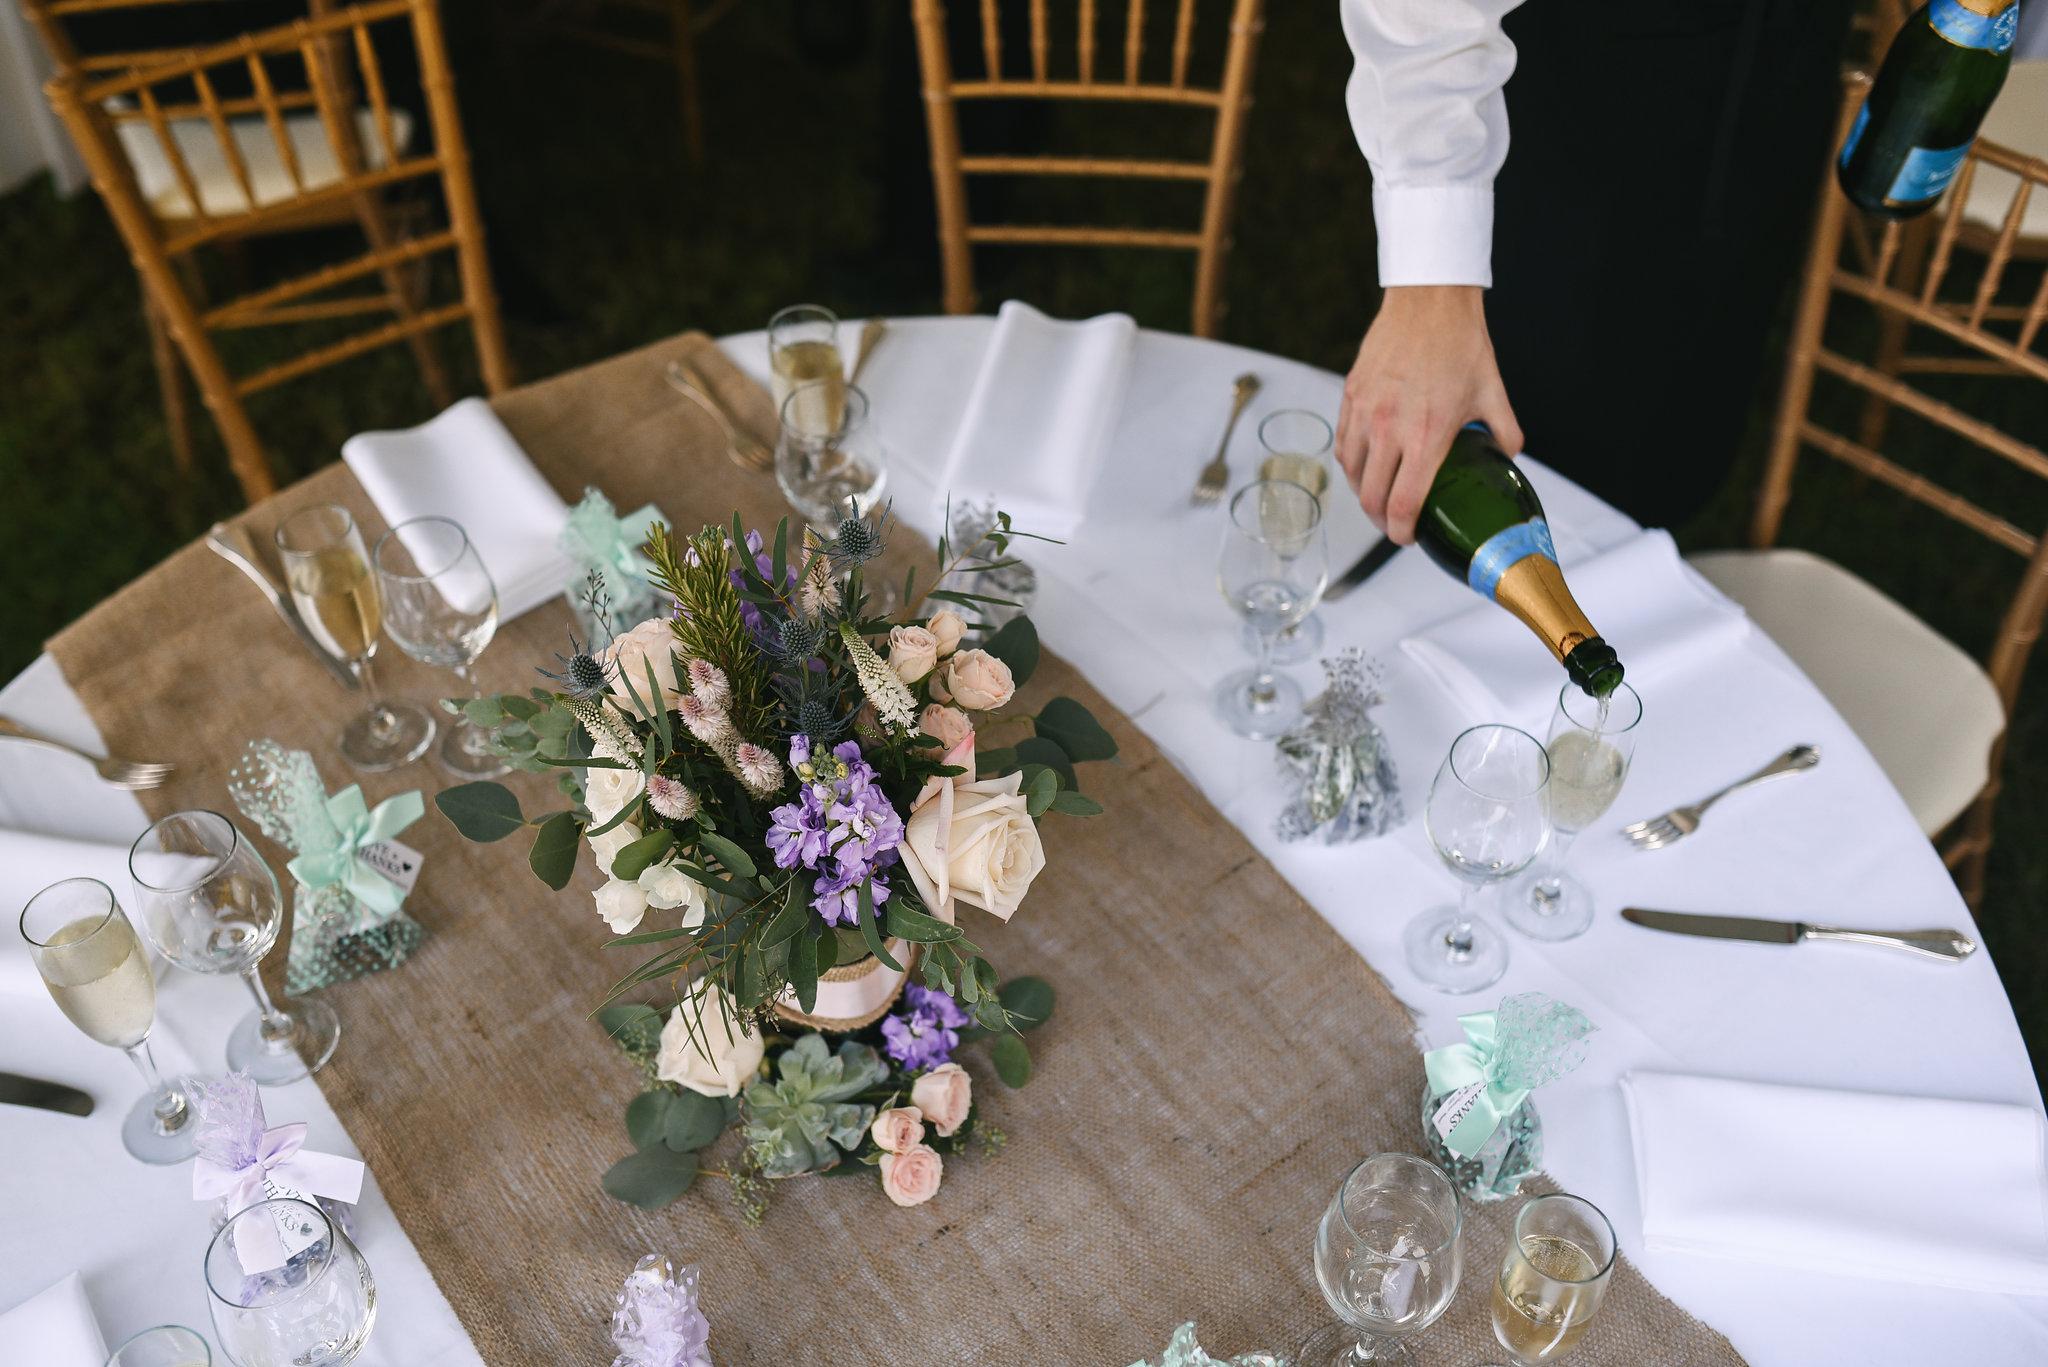 Maryland, Eastern Shore, Baltimore Wedding Photographer, Romantic, Boho, Backyard Wedding, Nature, Reception Decor, Table Settings, Floral Centerpieces, Michael Designs Florist